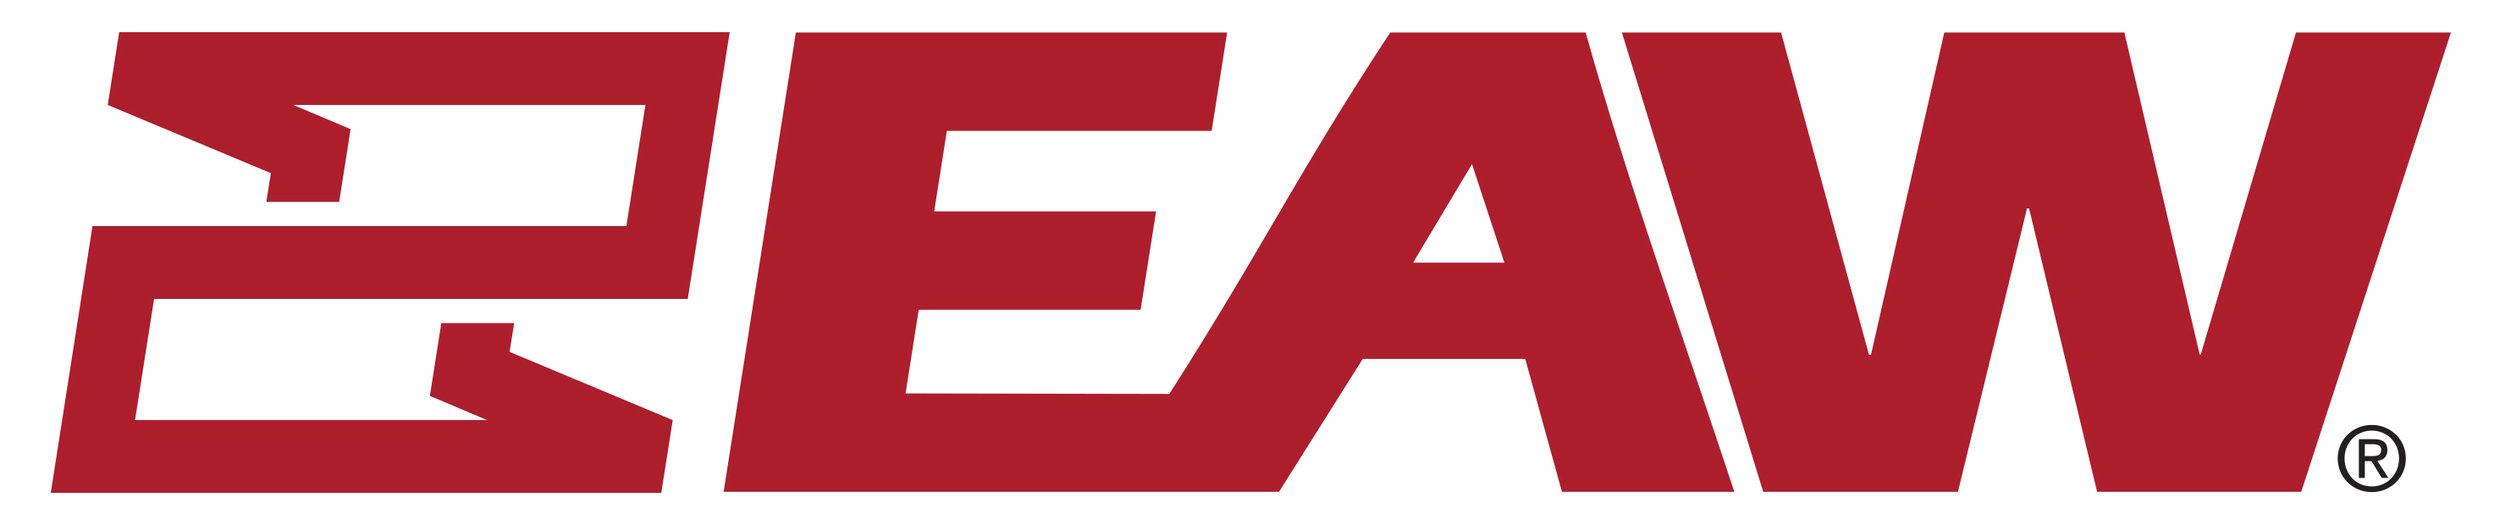 EAW logo.jpg